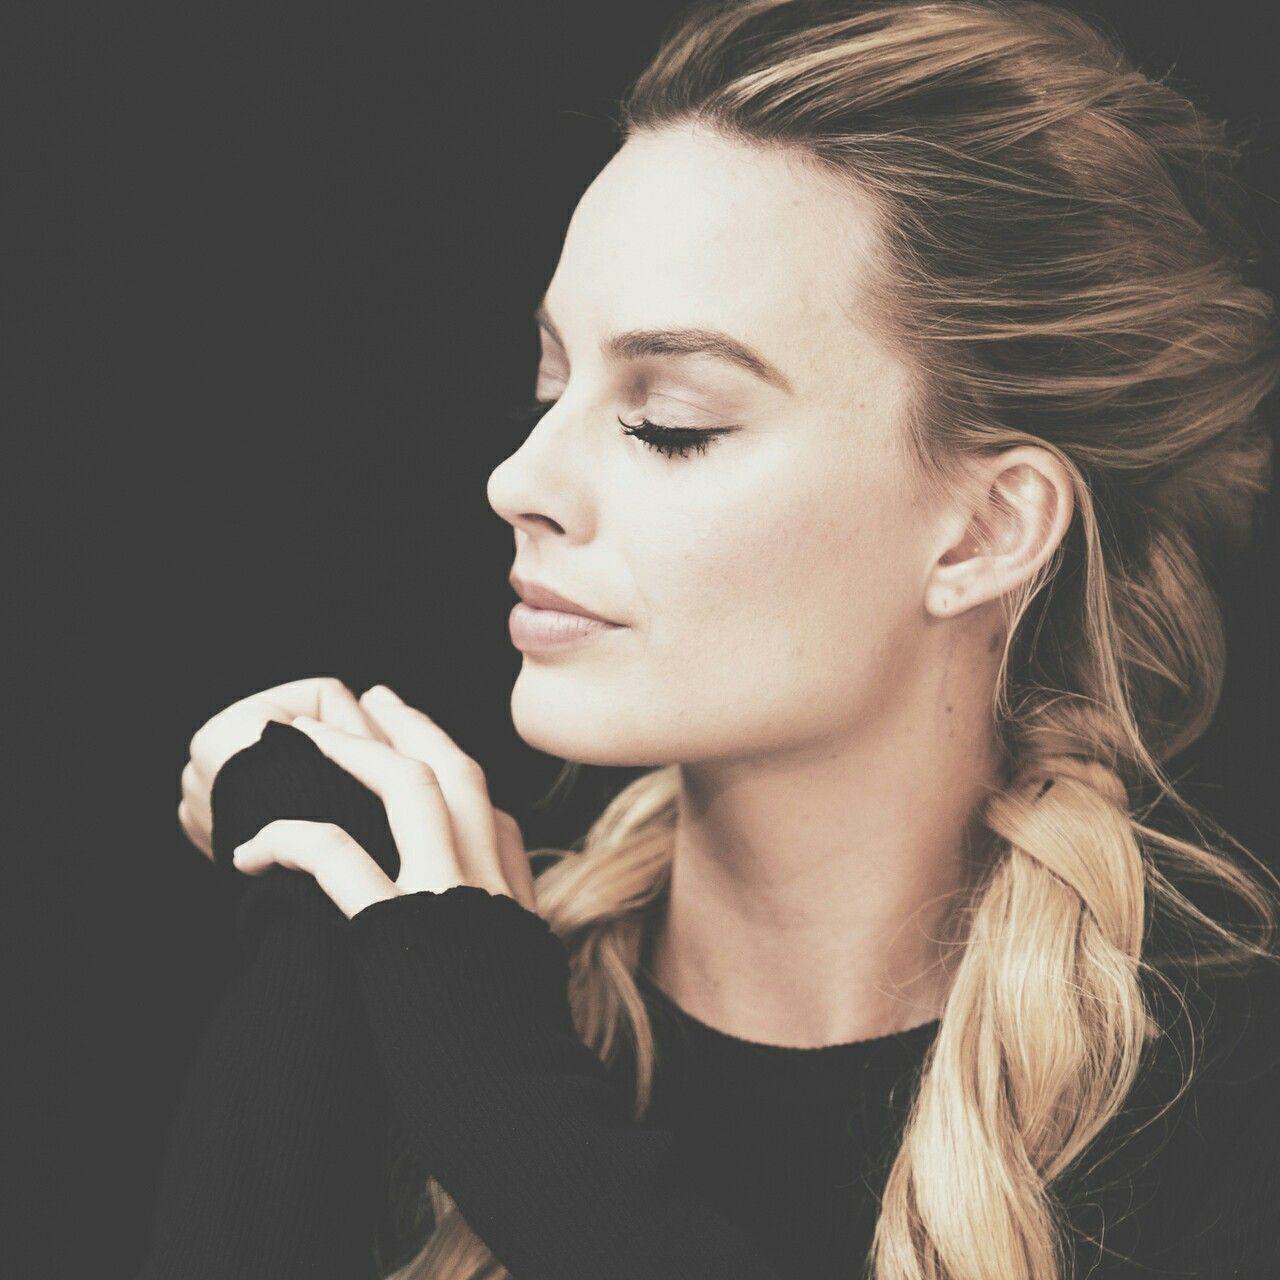 The Beautiful Margot Robbie